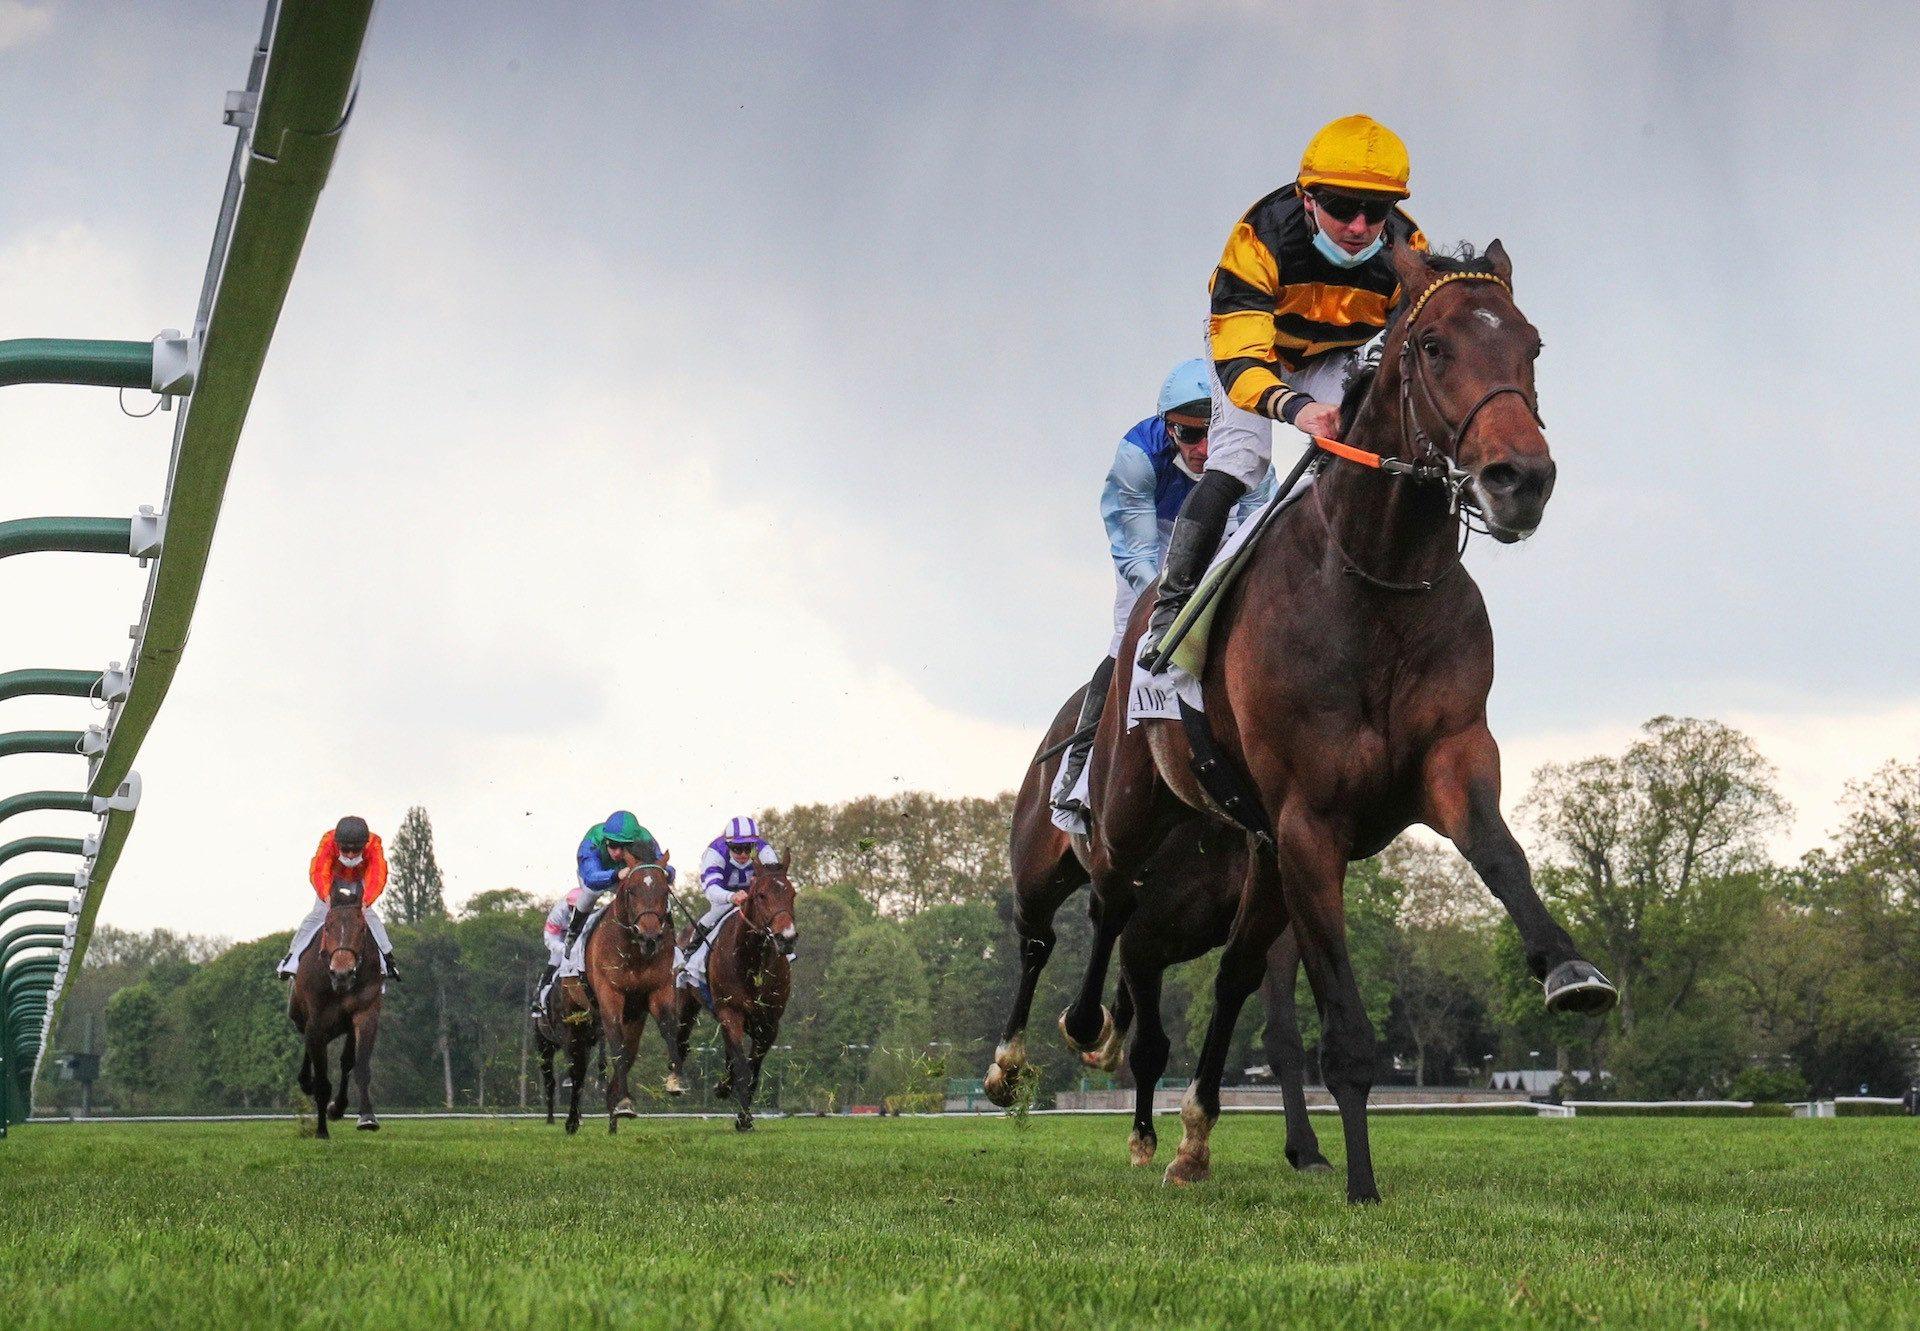 Fenelon (Fastnet Rock) Wins The Listed Prix De L' Avre At Longchamp